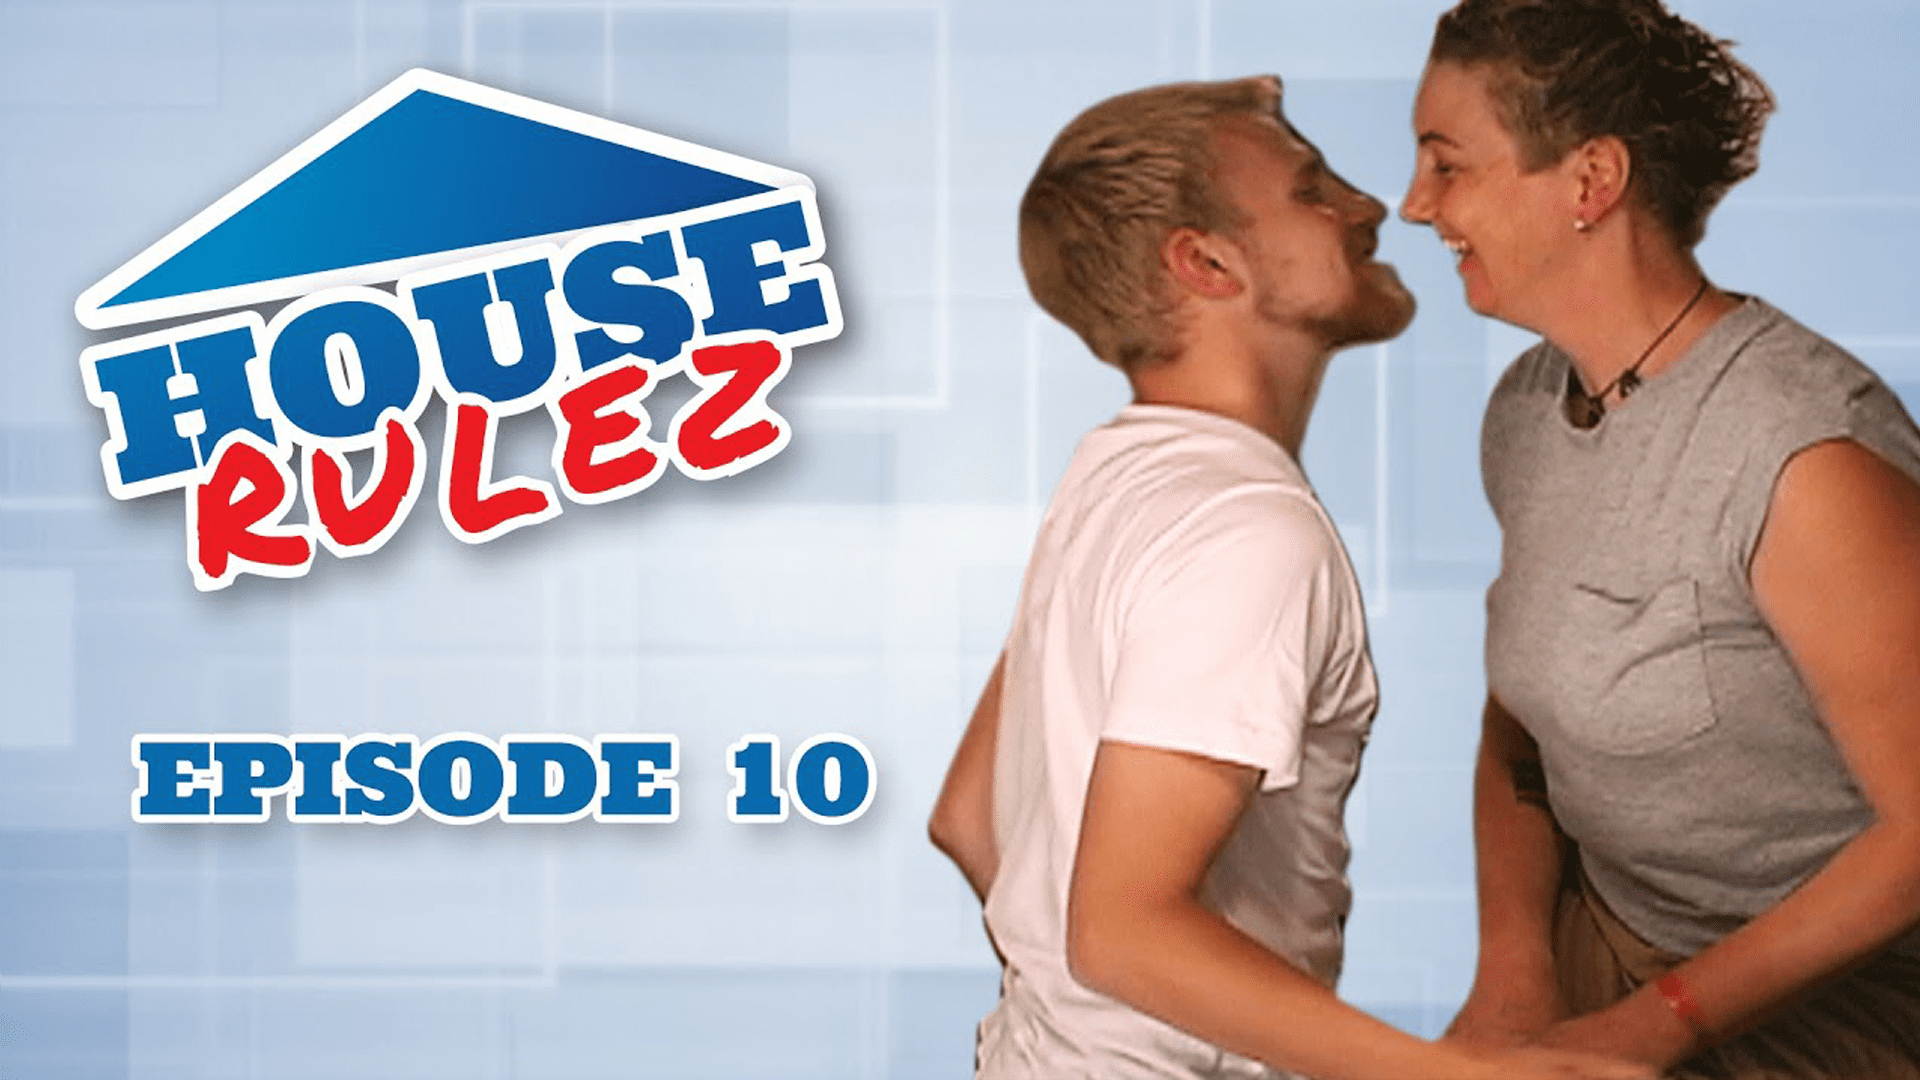 House Rulez Episode 10